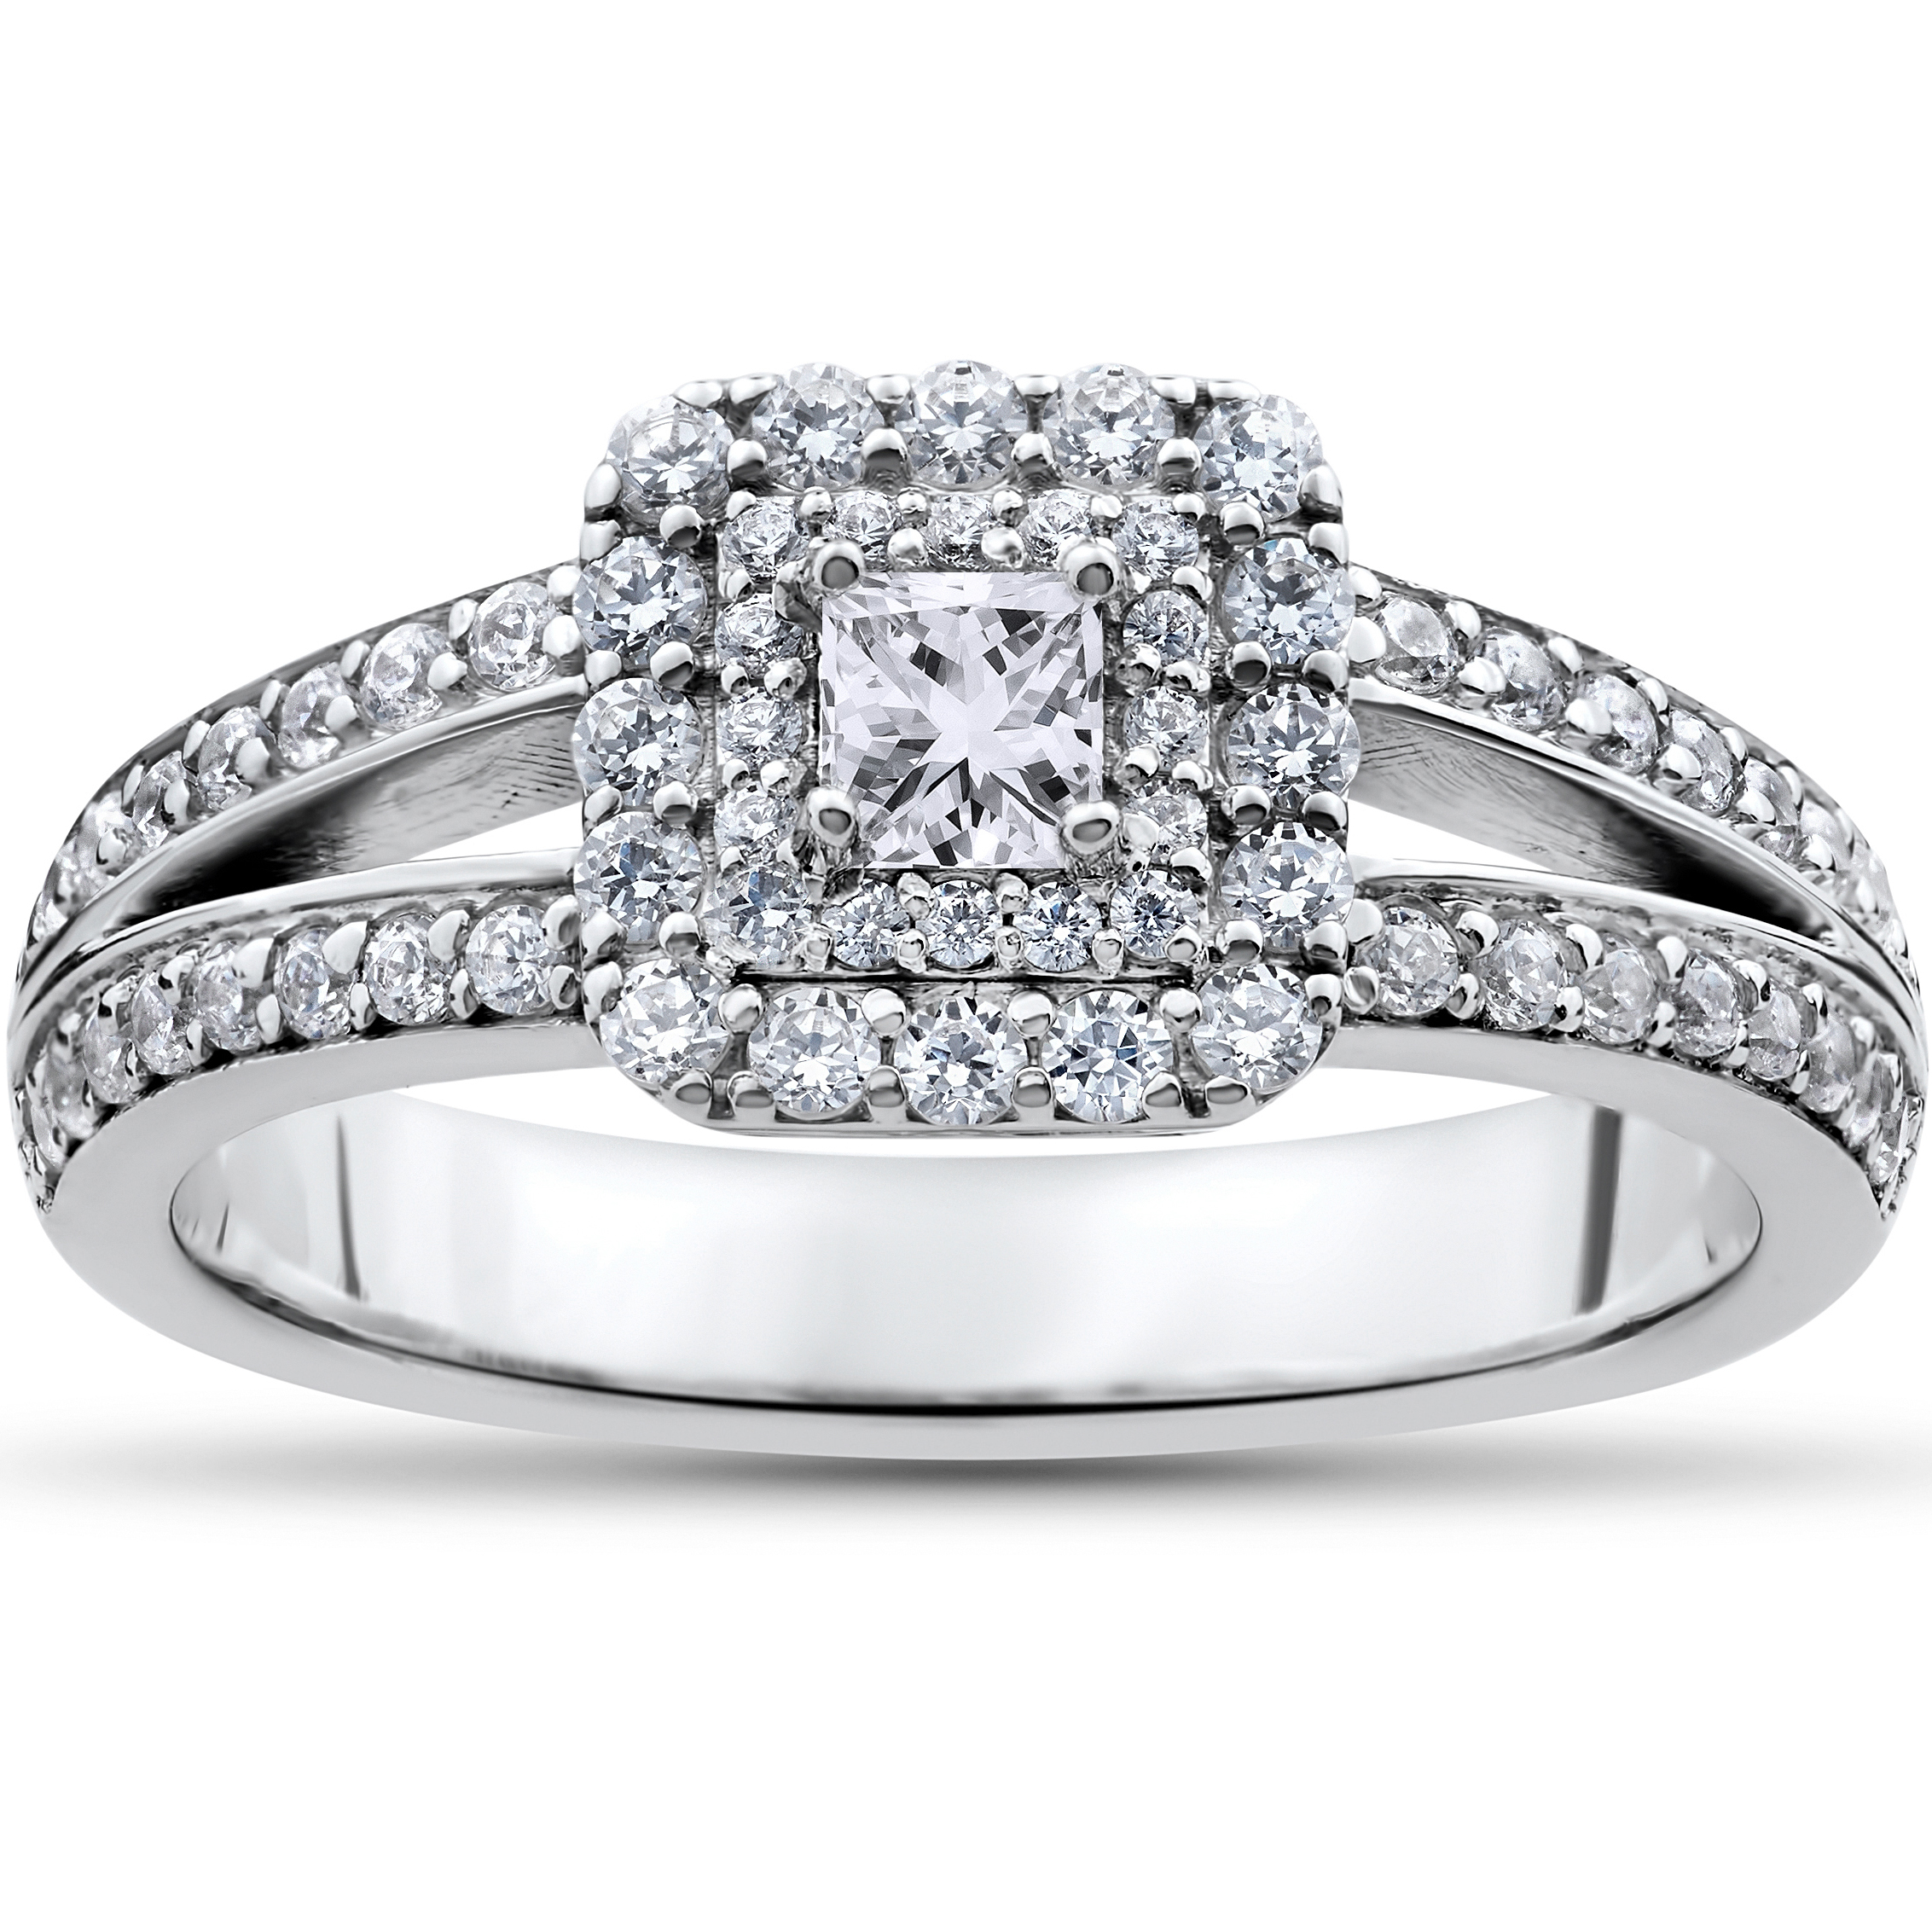 1 ct Princess Cut Diamond Double Halo Engagement Ring 14k White